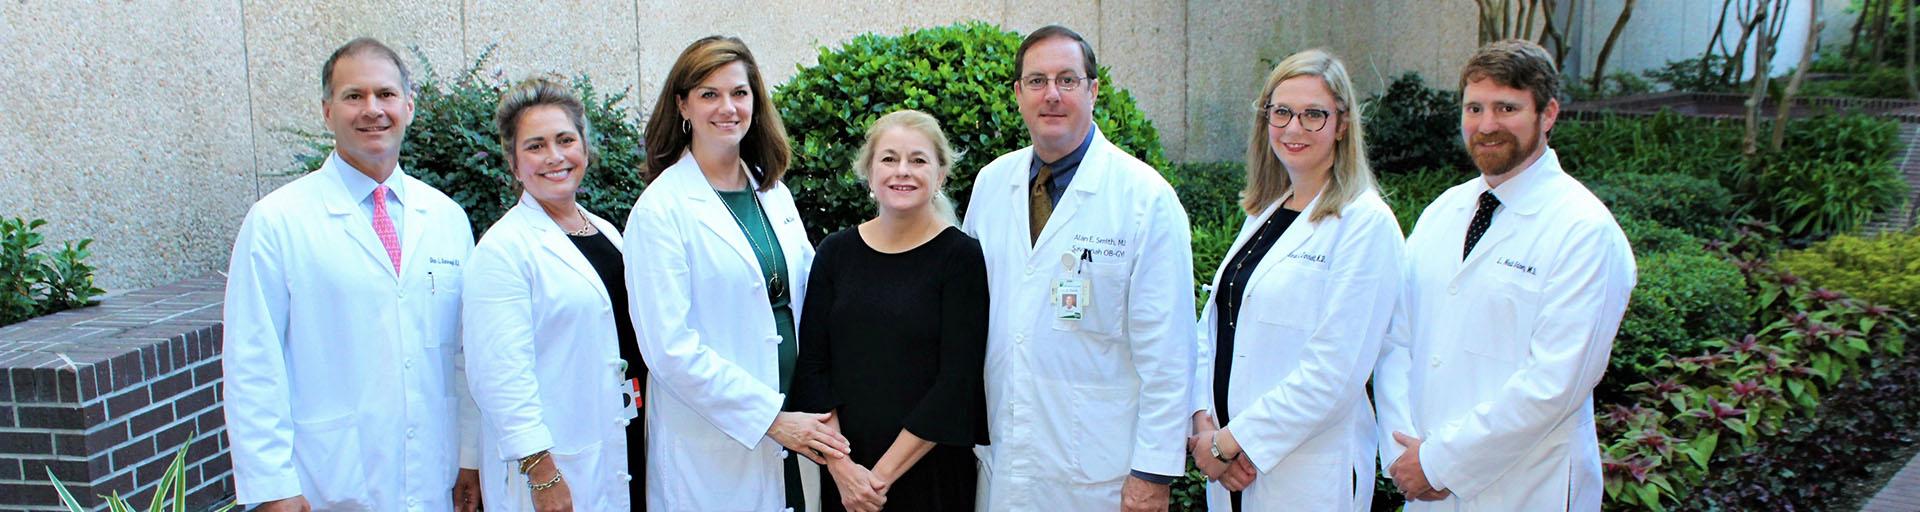 Group photo of the doctors at Savannah OBGYN